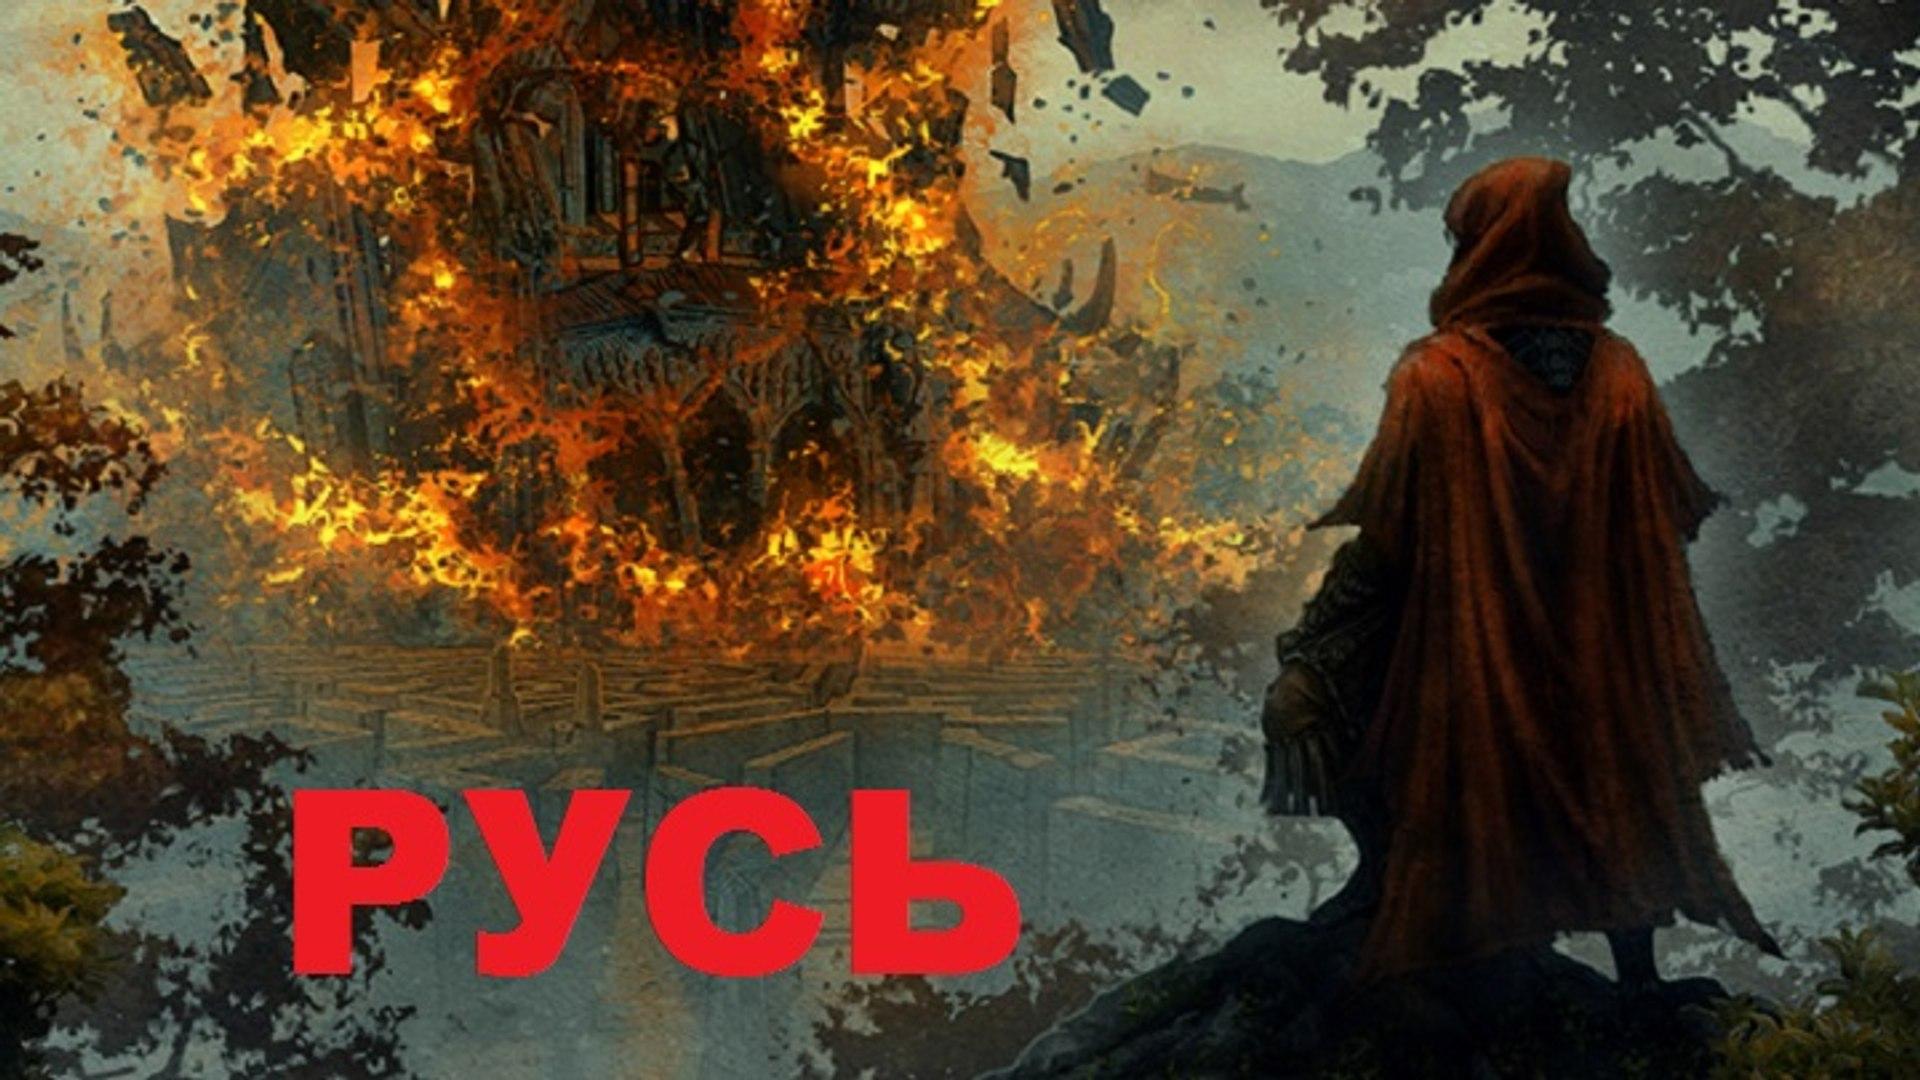 Баста & Смоки Мо Feat. Елена Ваенга - Каменные Цветы - Александр Невский FULL HD